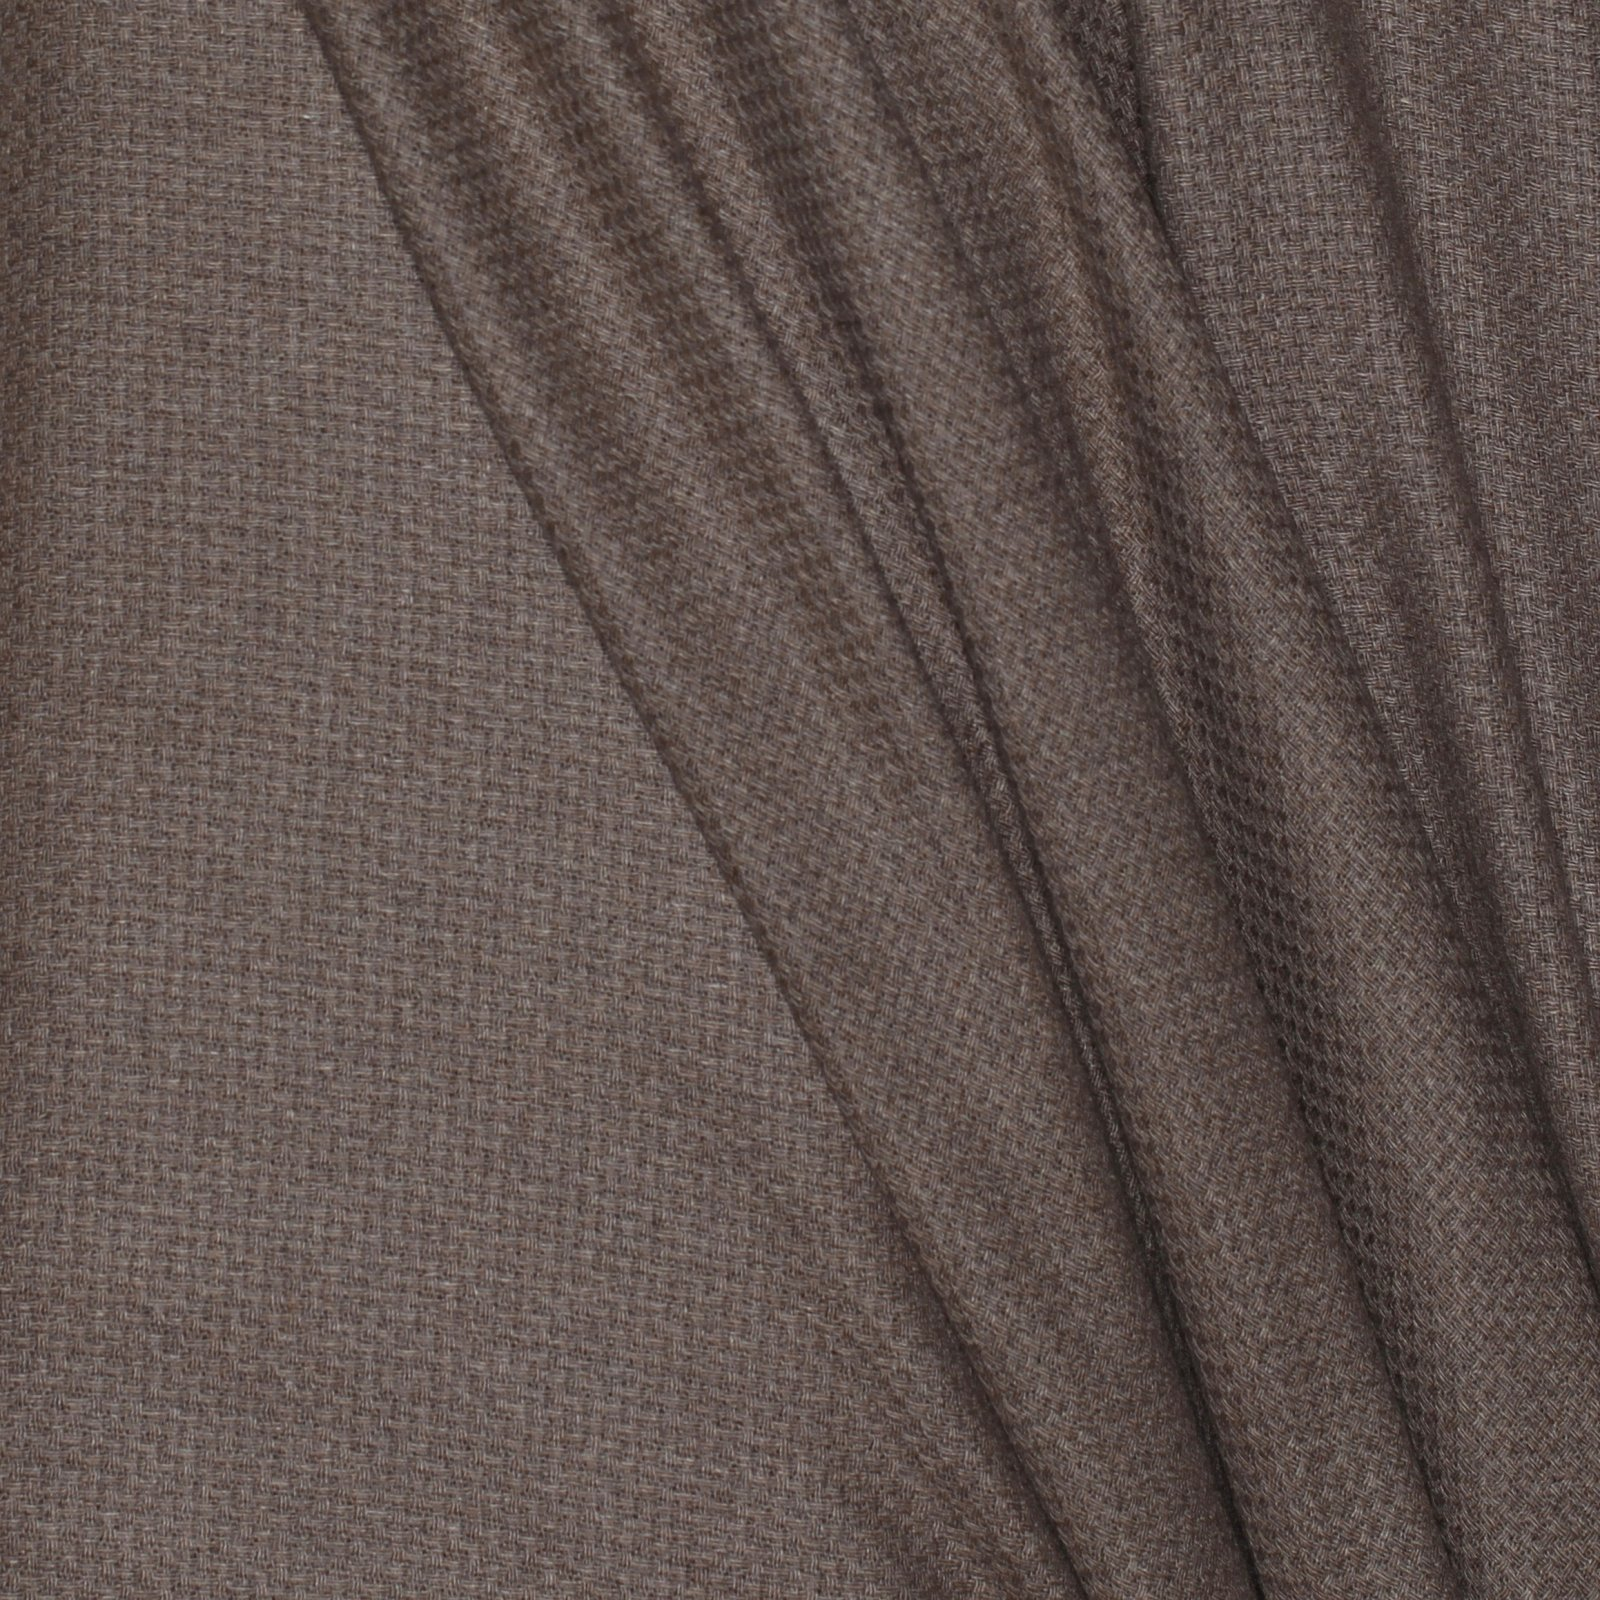 Light Umber Basketweave Italian Cashmere